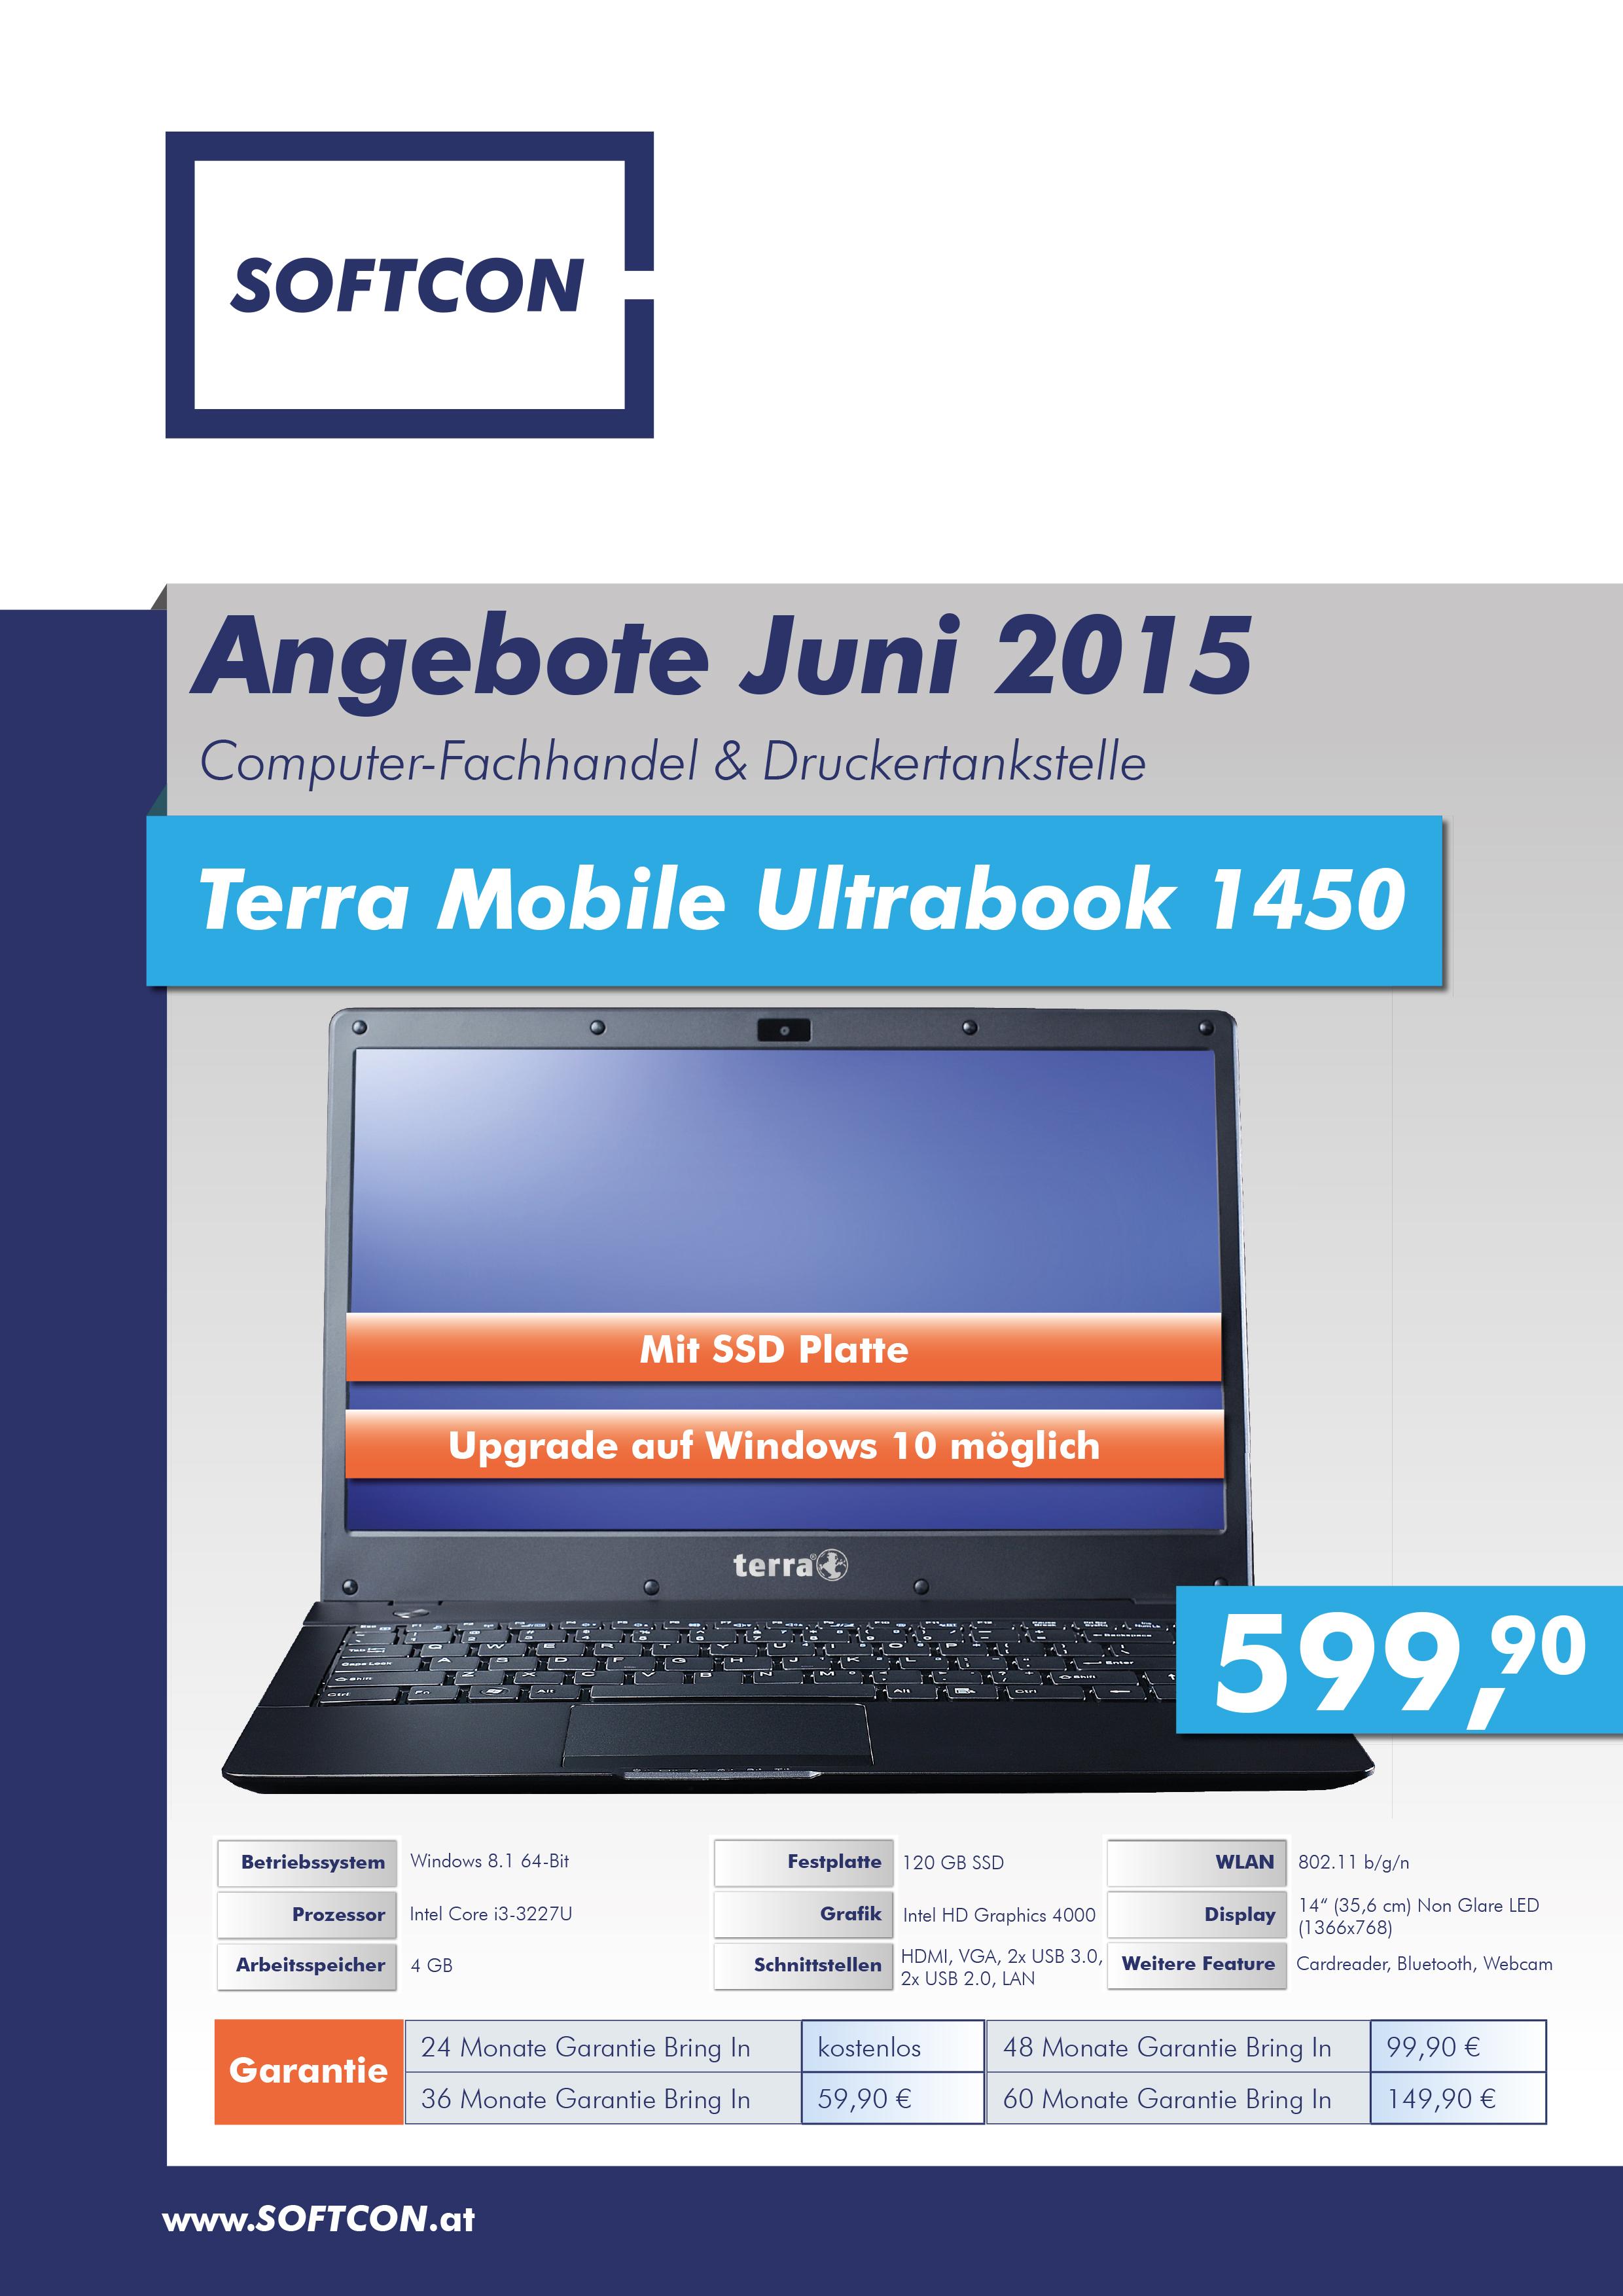 Softcon Angebote Juni 2015